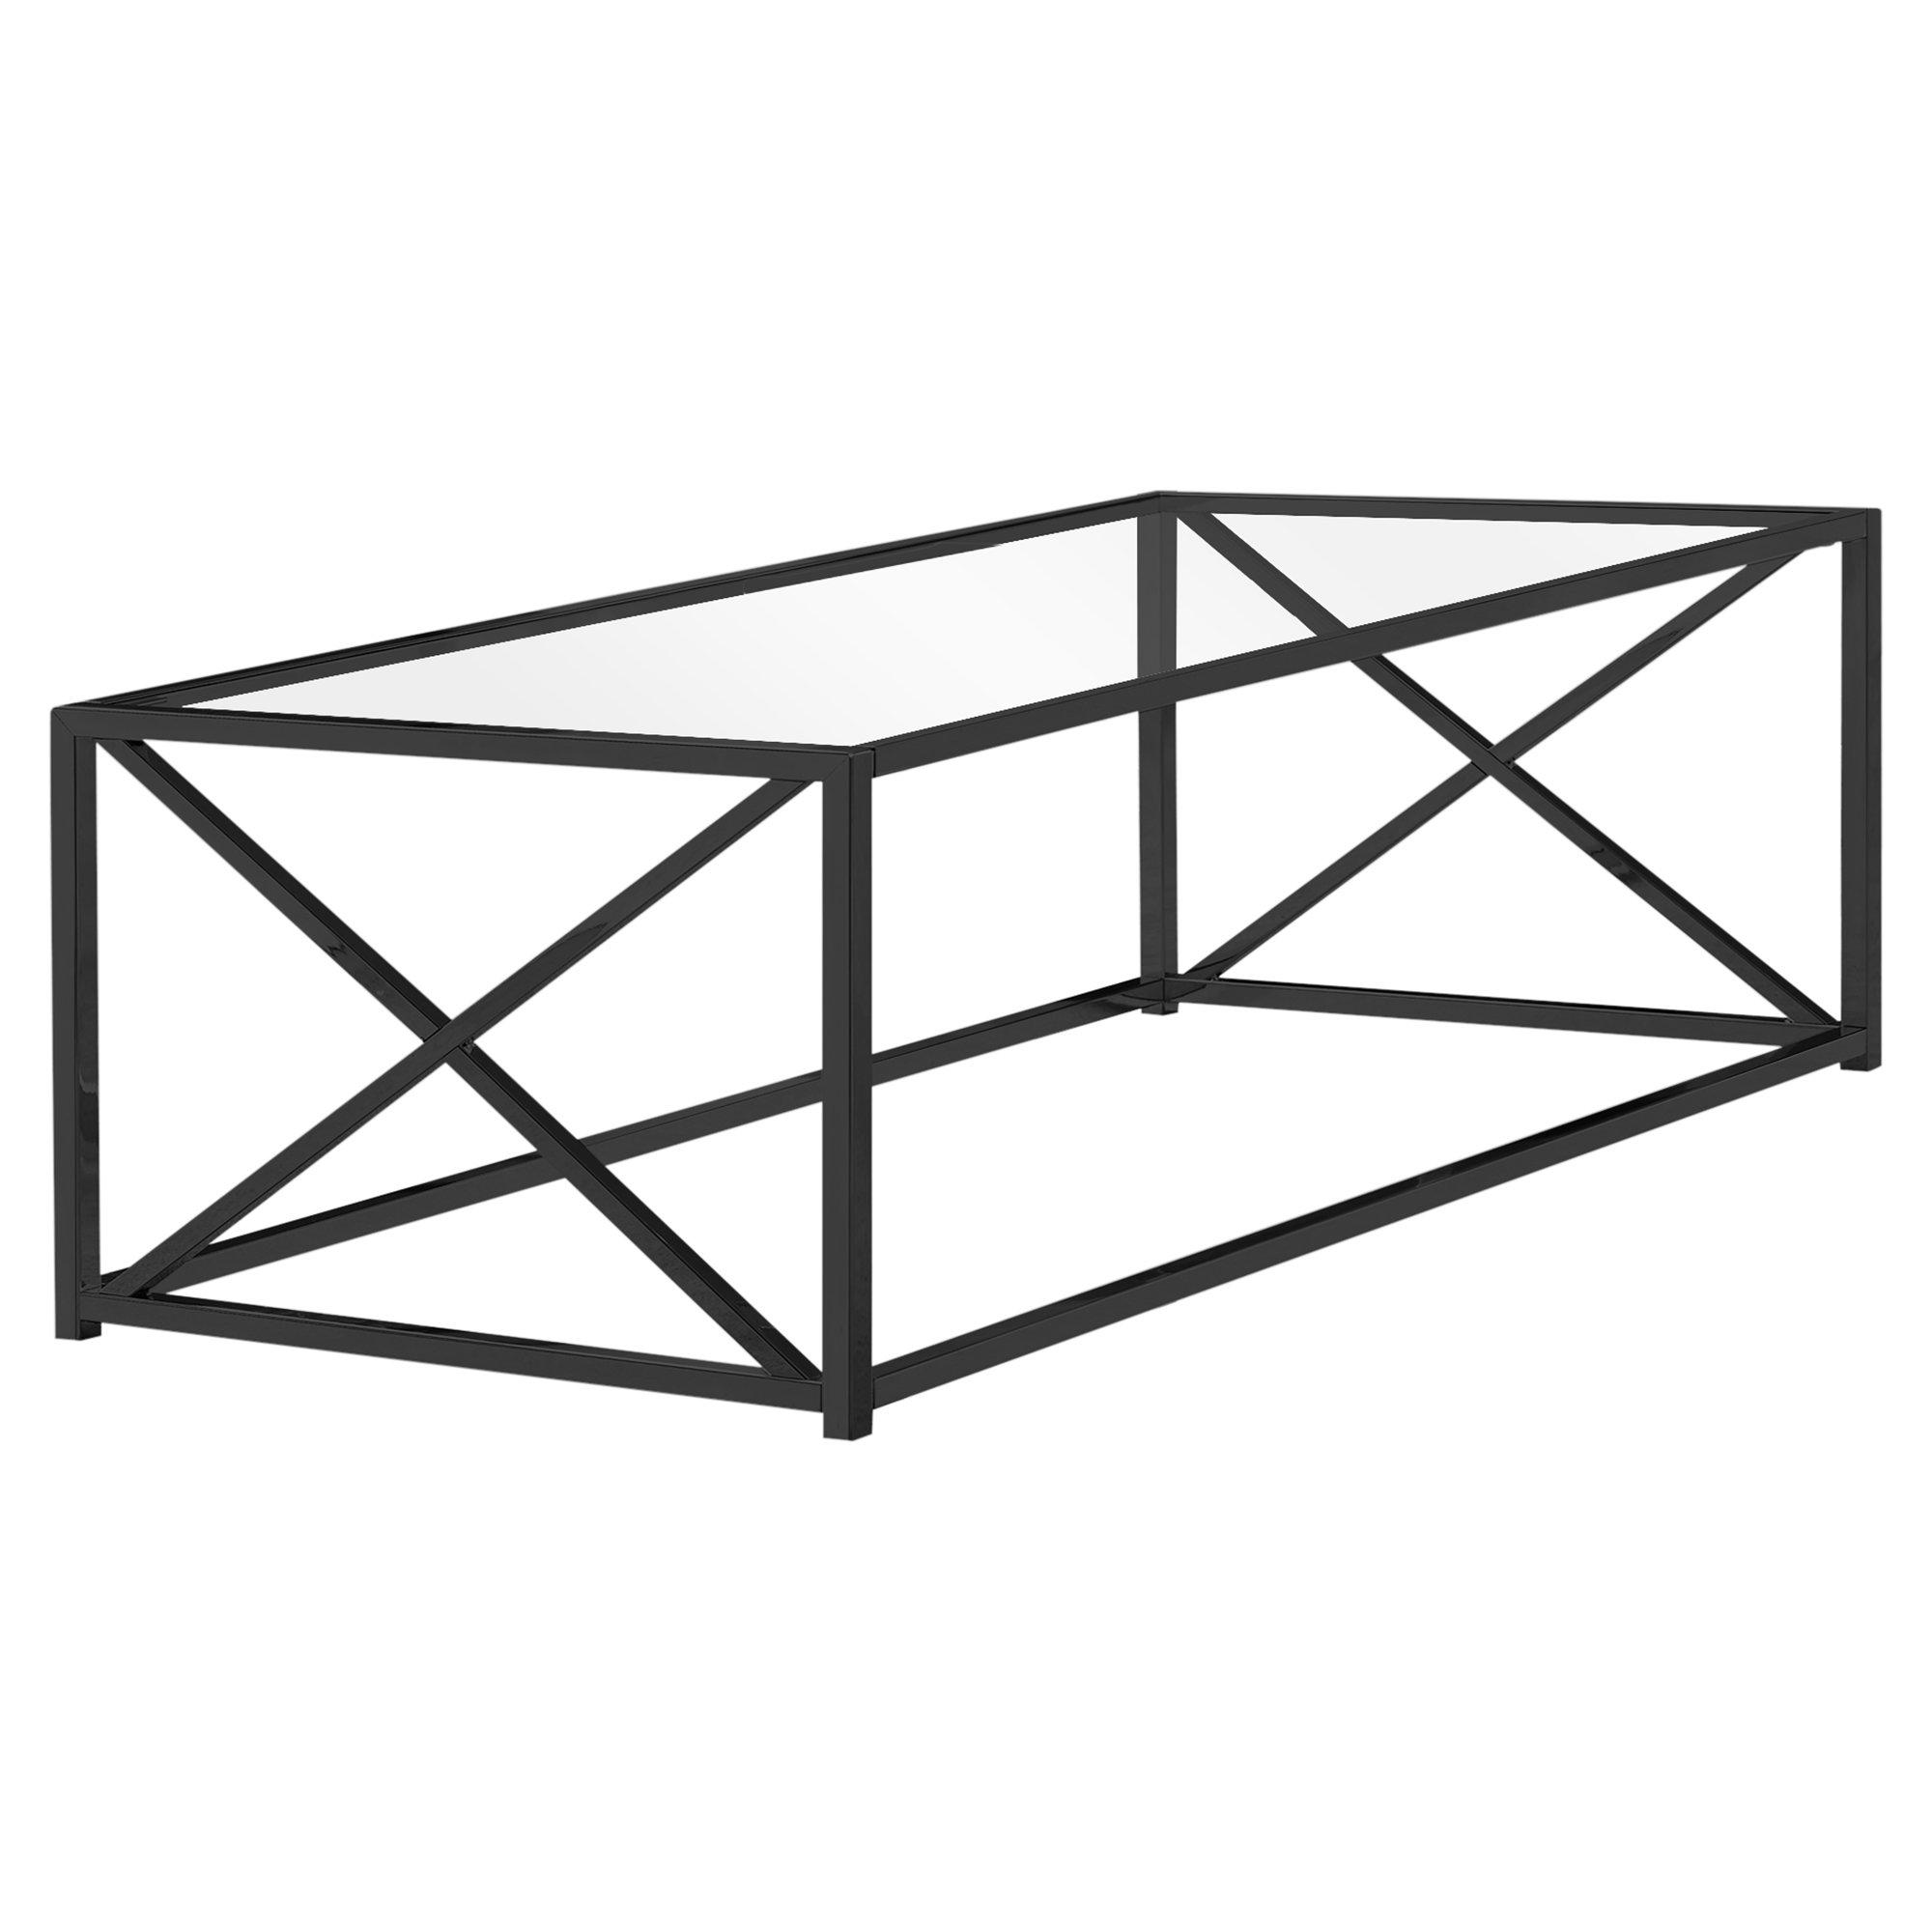 "COFFEE TABLE - 44""L / BLACK NICKEL METAL / TEMPERED GLASS"